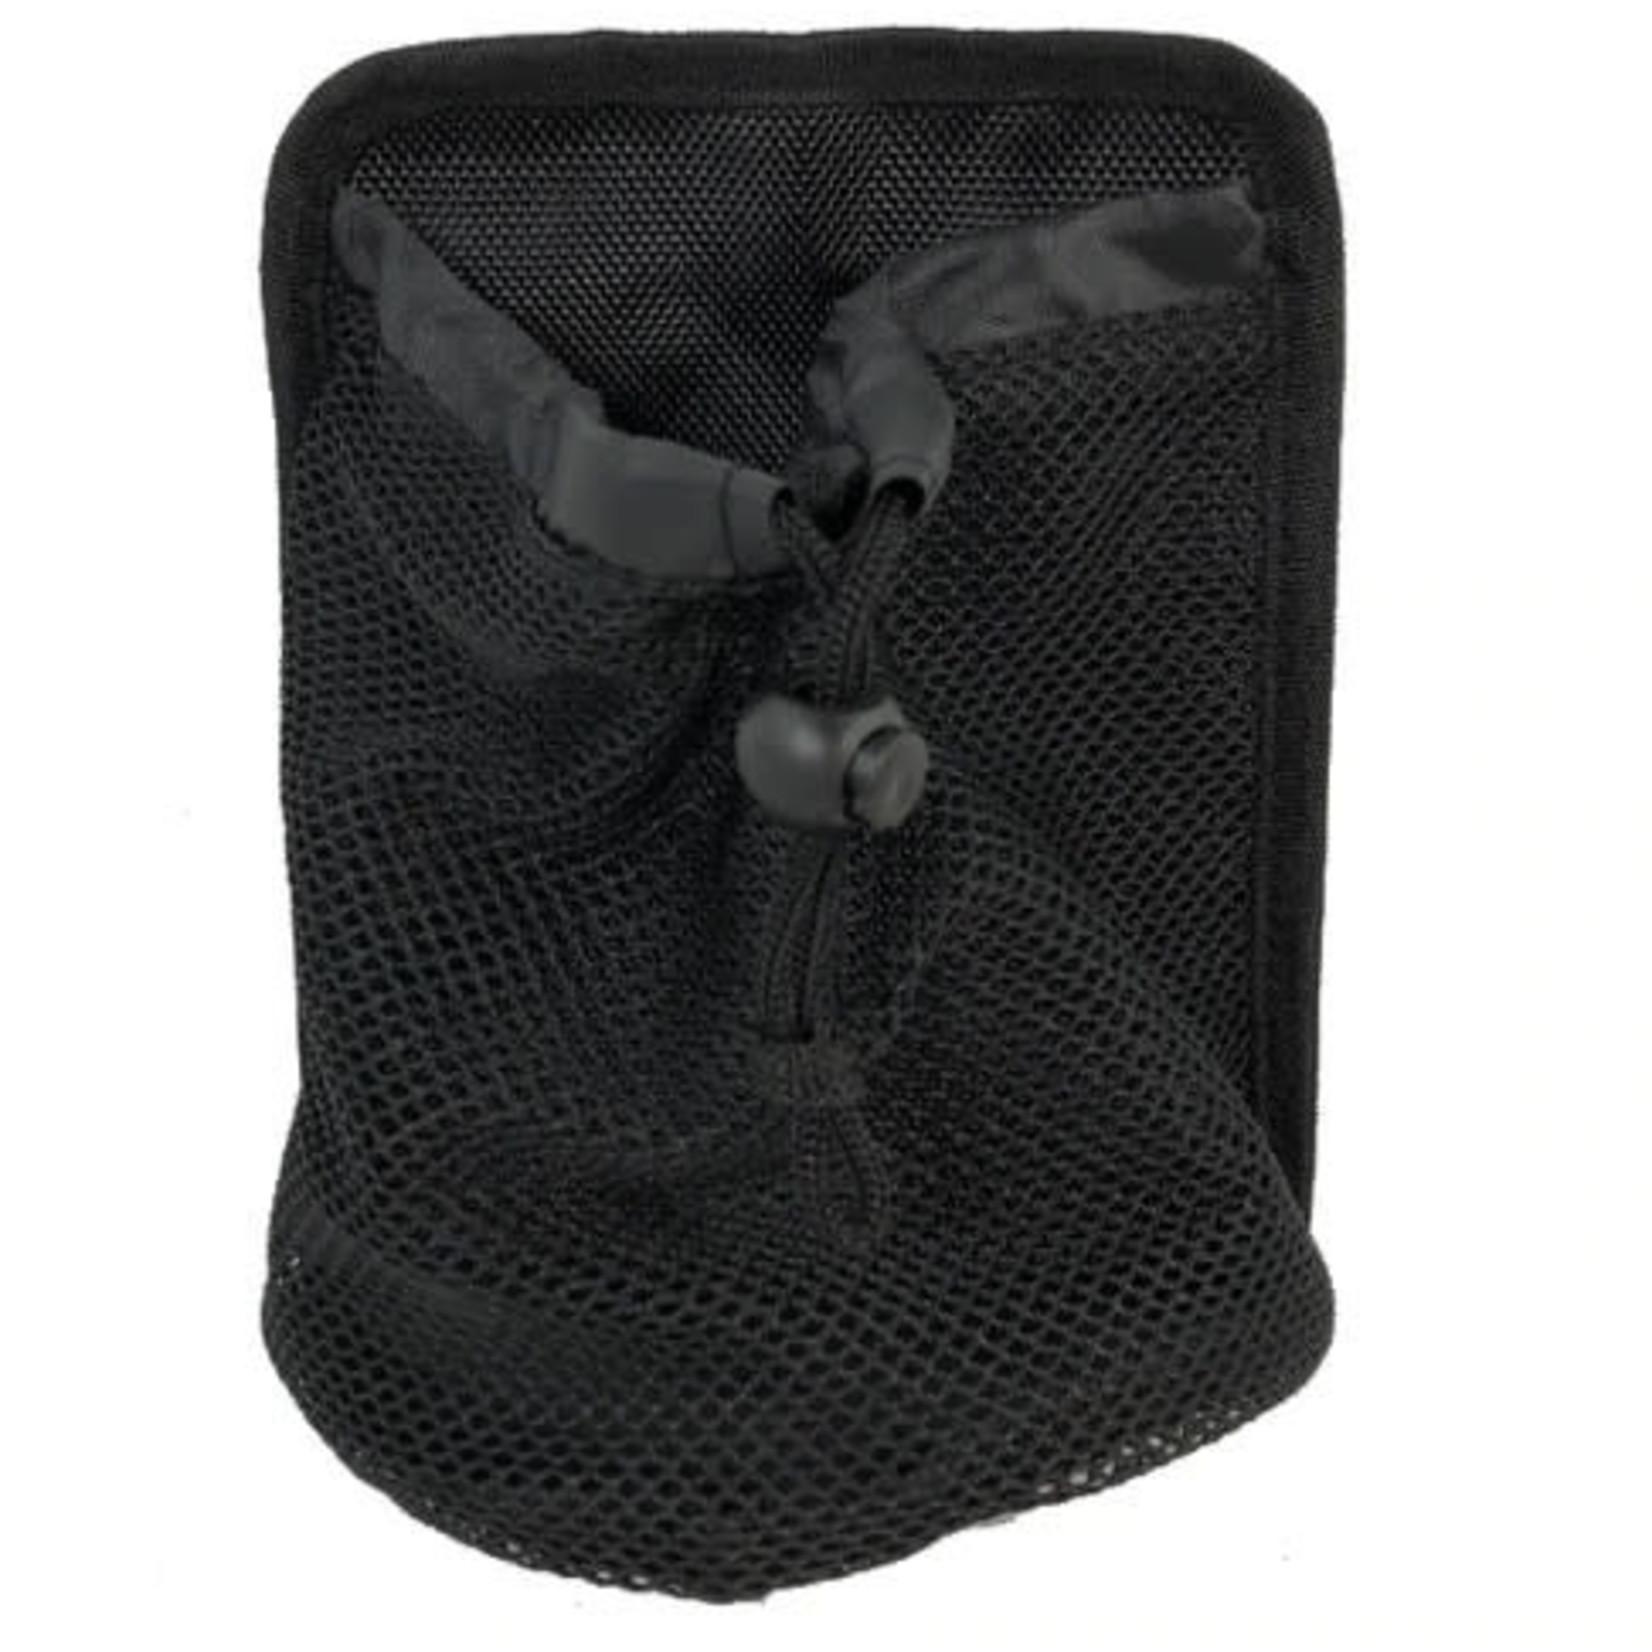 Battlefoam Beverage Pack Molle Accessory (Black)